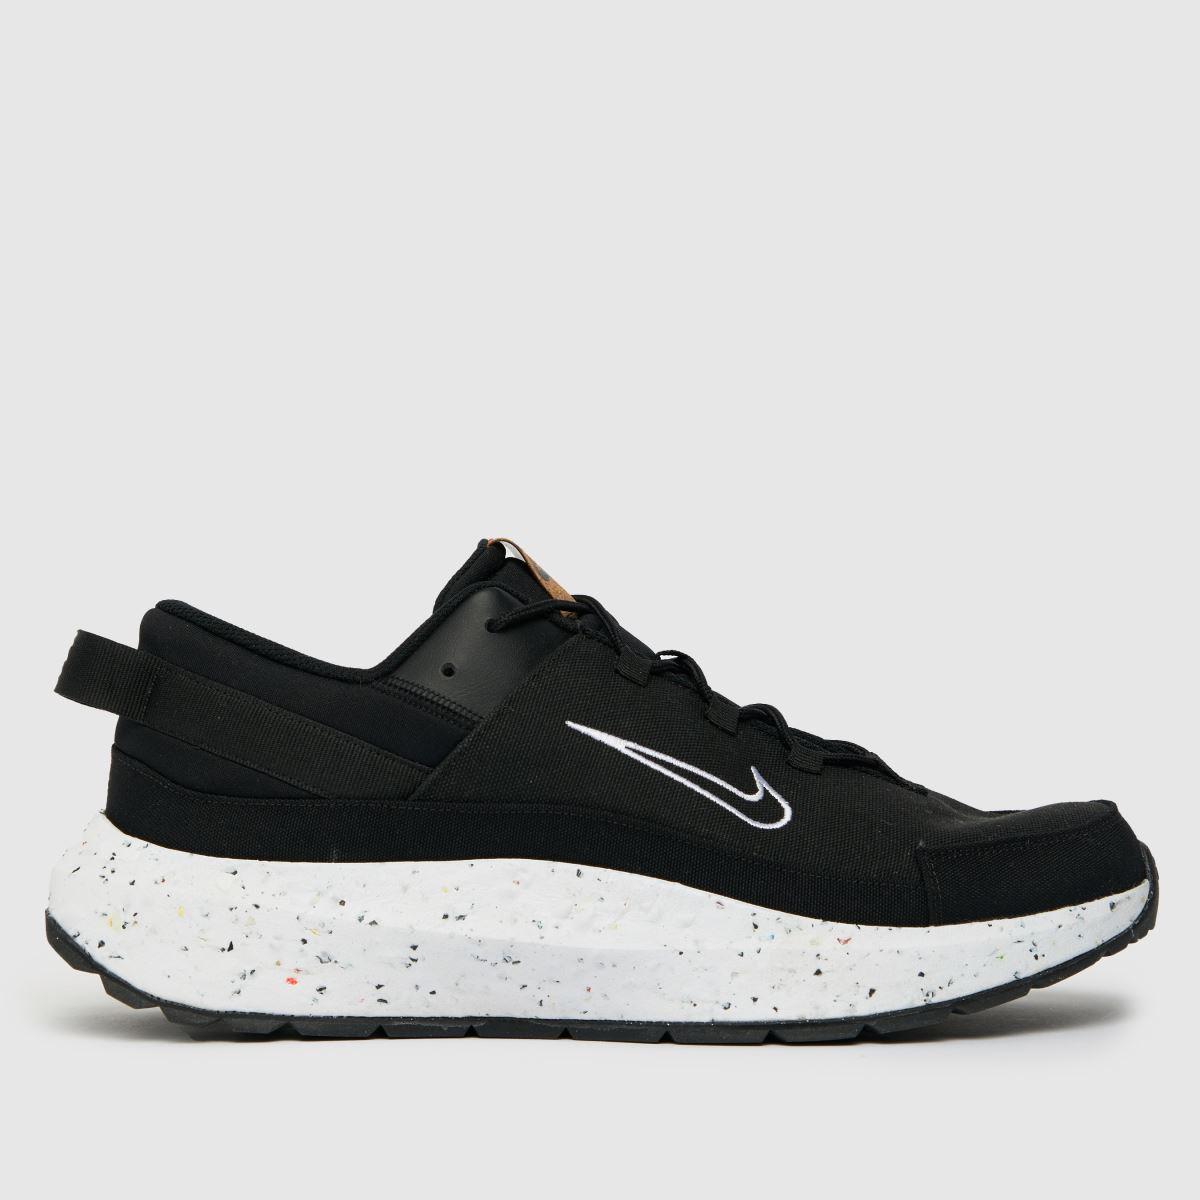 Nike Black & White Crate Remixa Trainers